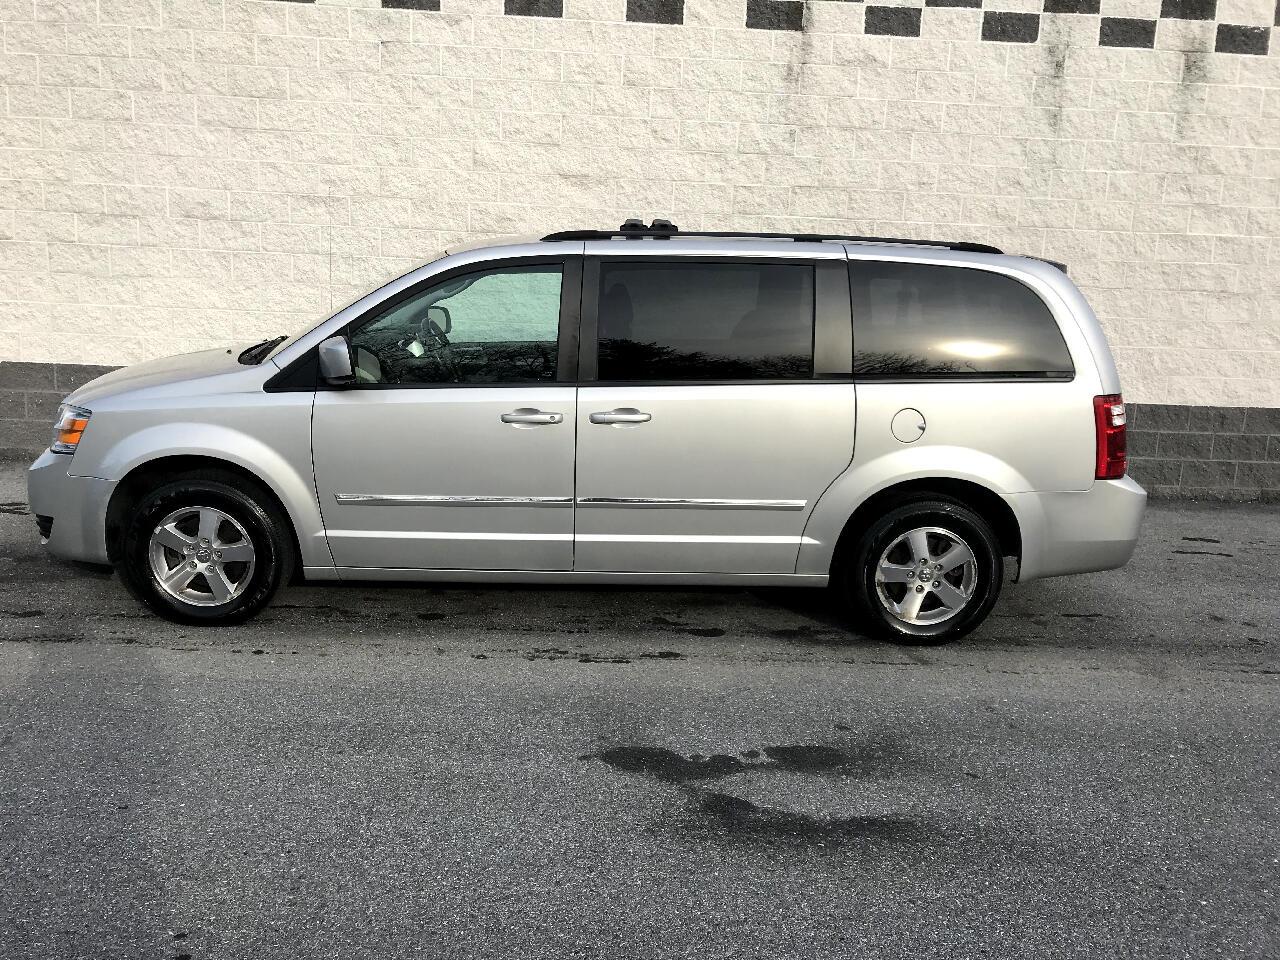 2009 Dodge Grand Caravan 4dr SXT